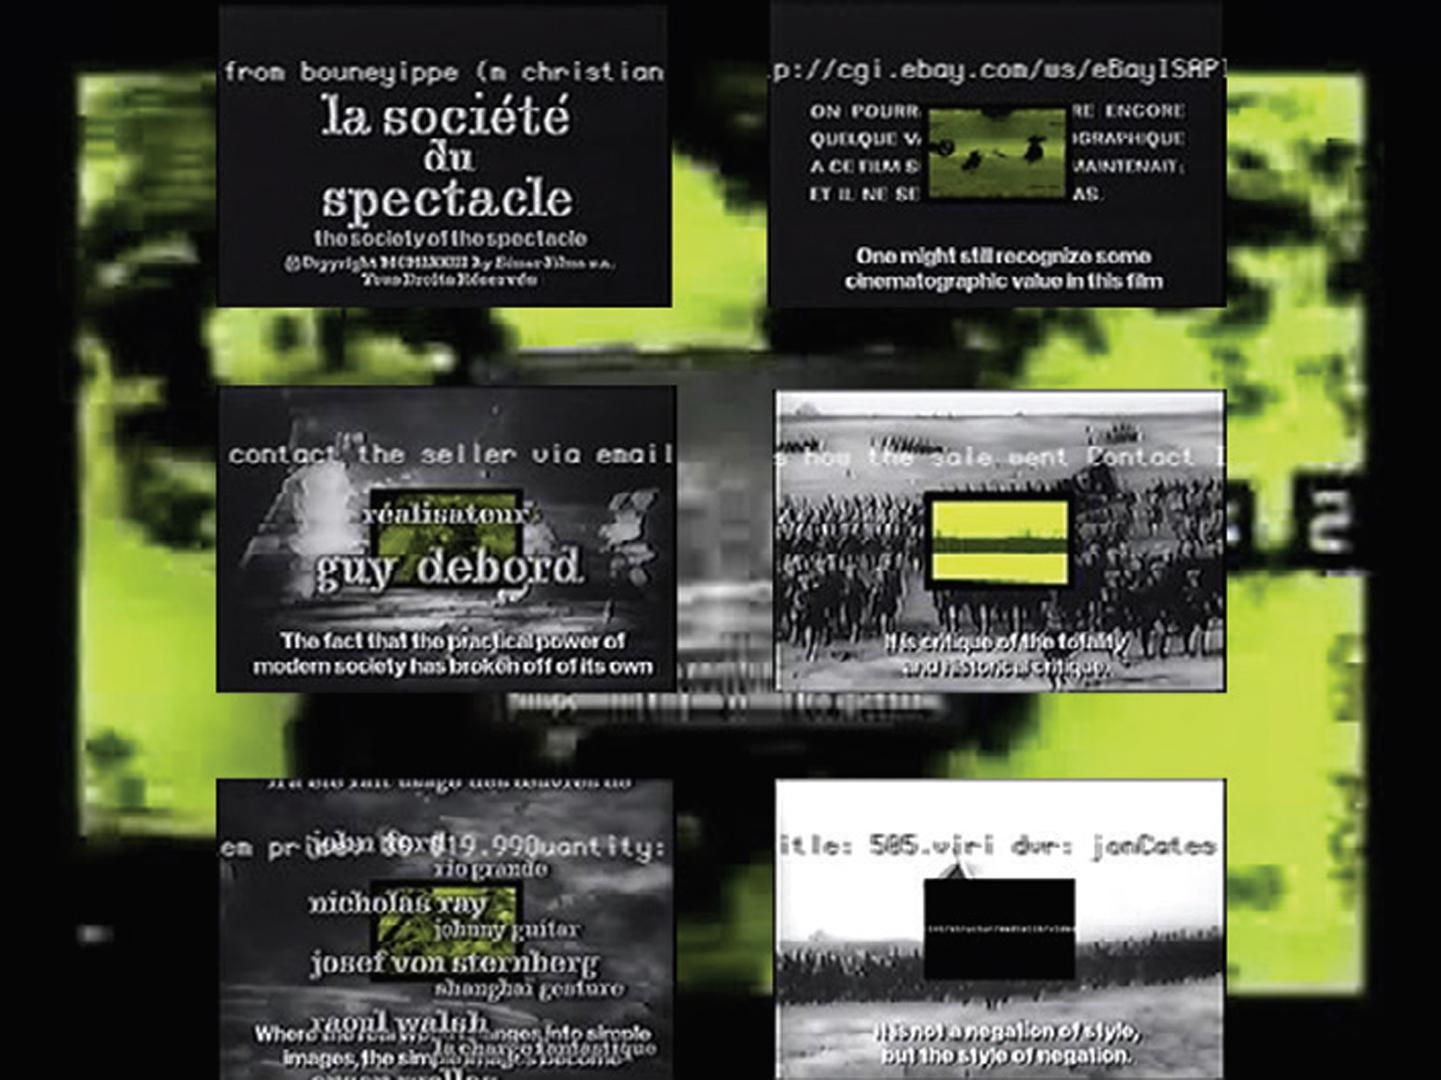 ©green.qt_slippage.mov (1999), 505.VIRI (2005), Broken Phone Gradient (2015), Small Horn (2015), jonCates, green.qt_slippage.mov, 505.VIRI, Broken Phone Gradient and Small Horn